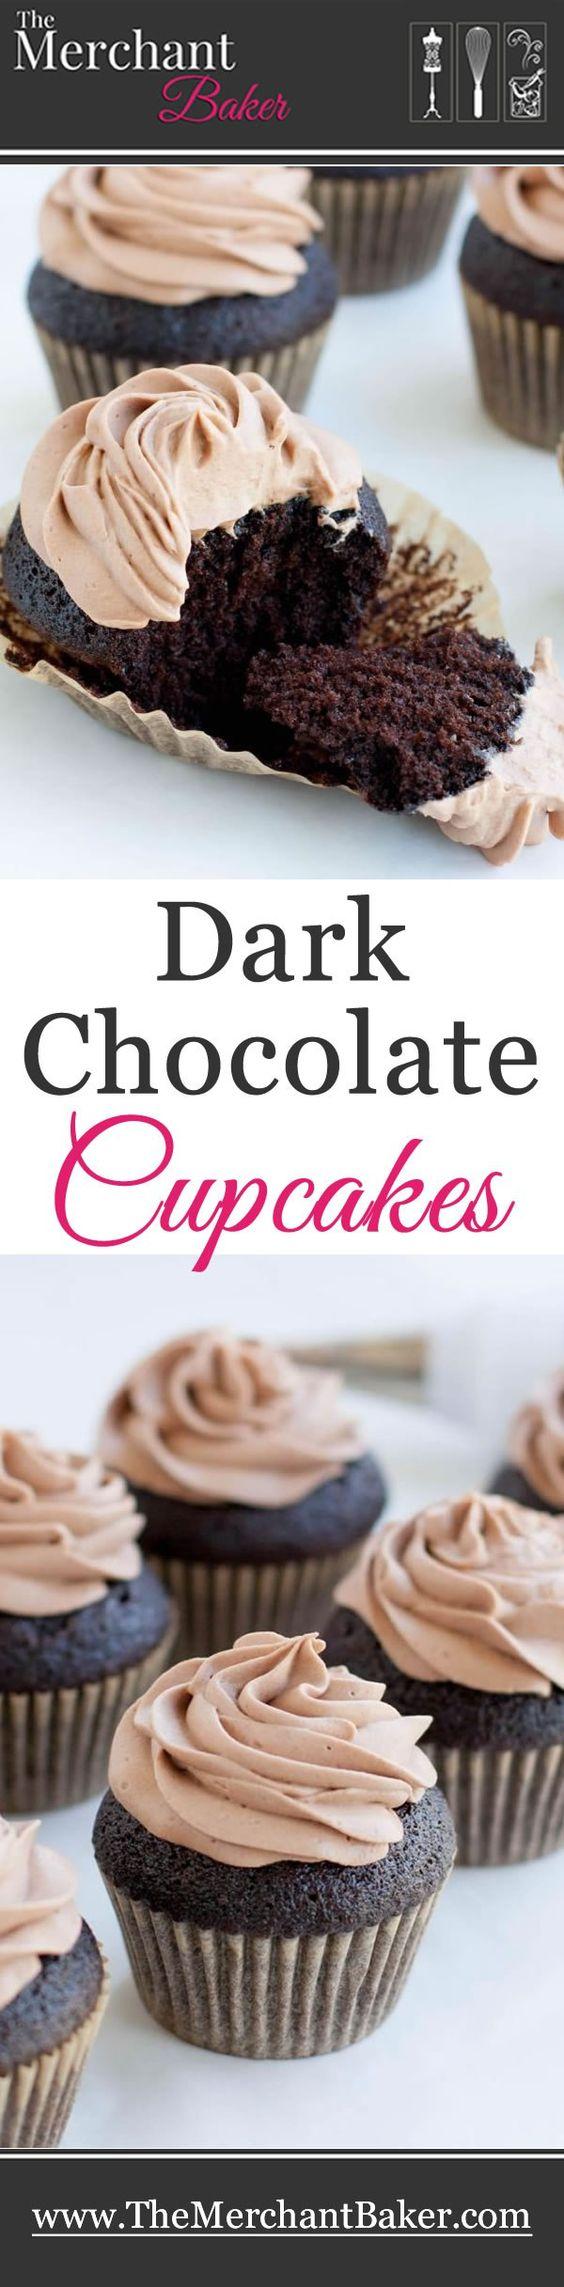 Chocolate whipped cream, Dark chocolate cupcakes and Chocolate flavors ...